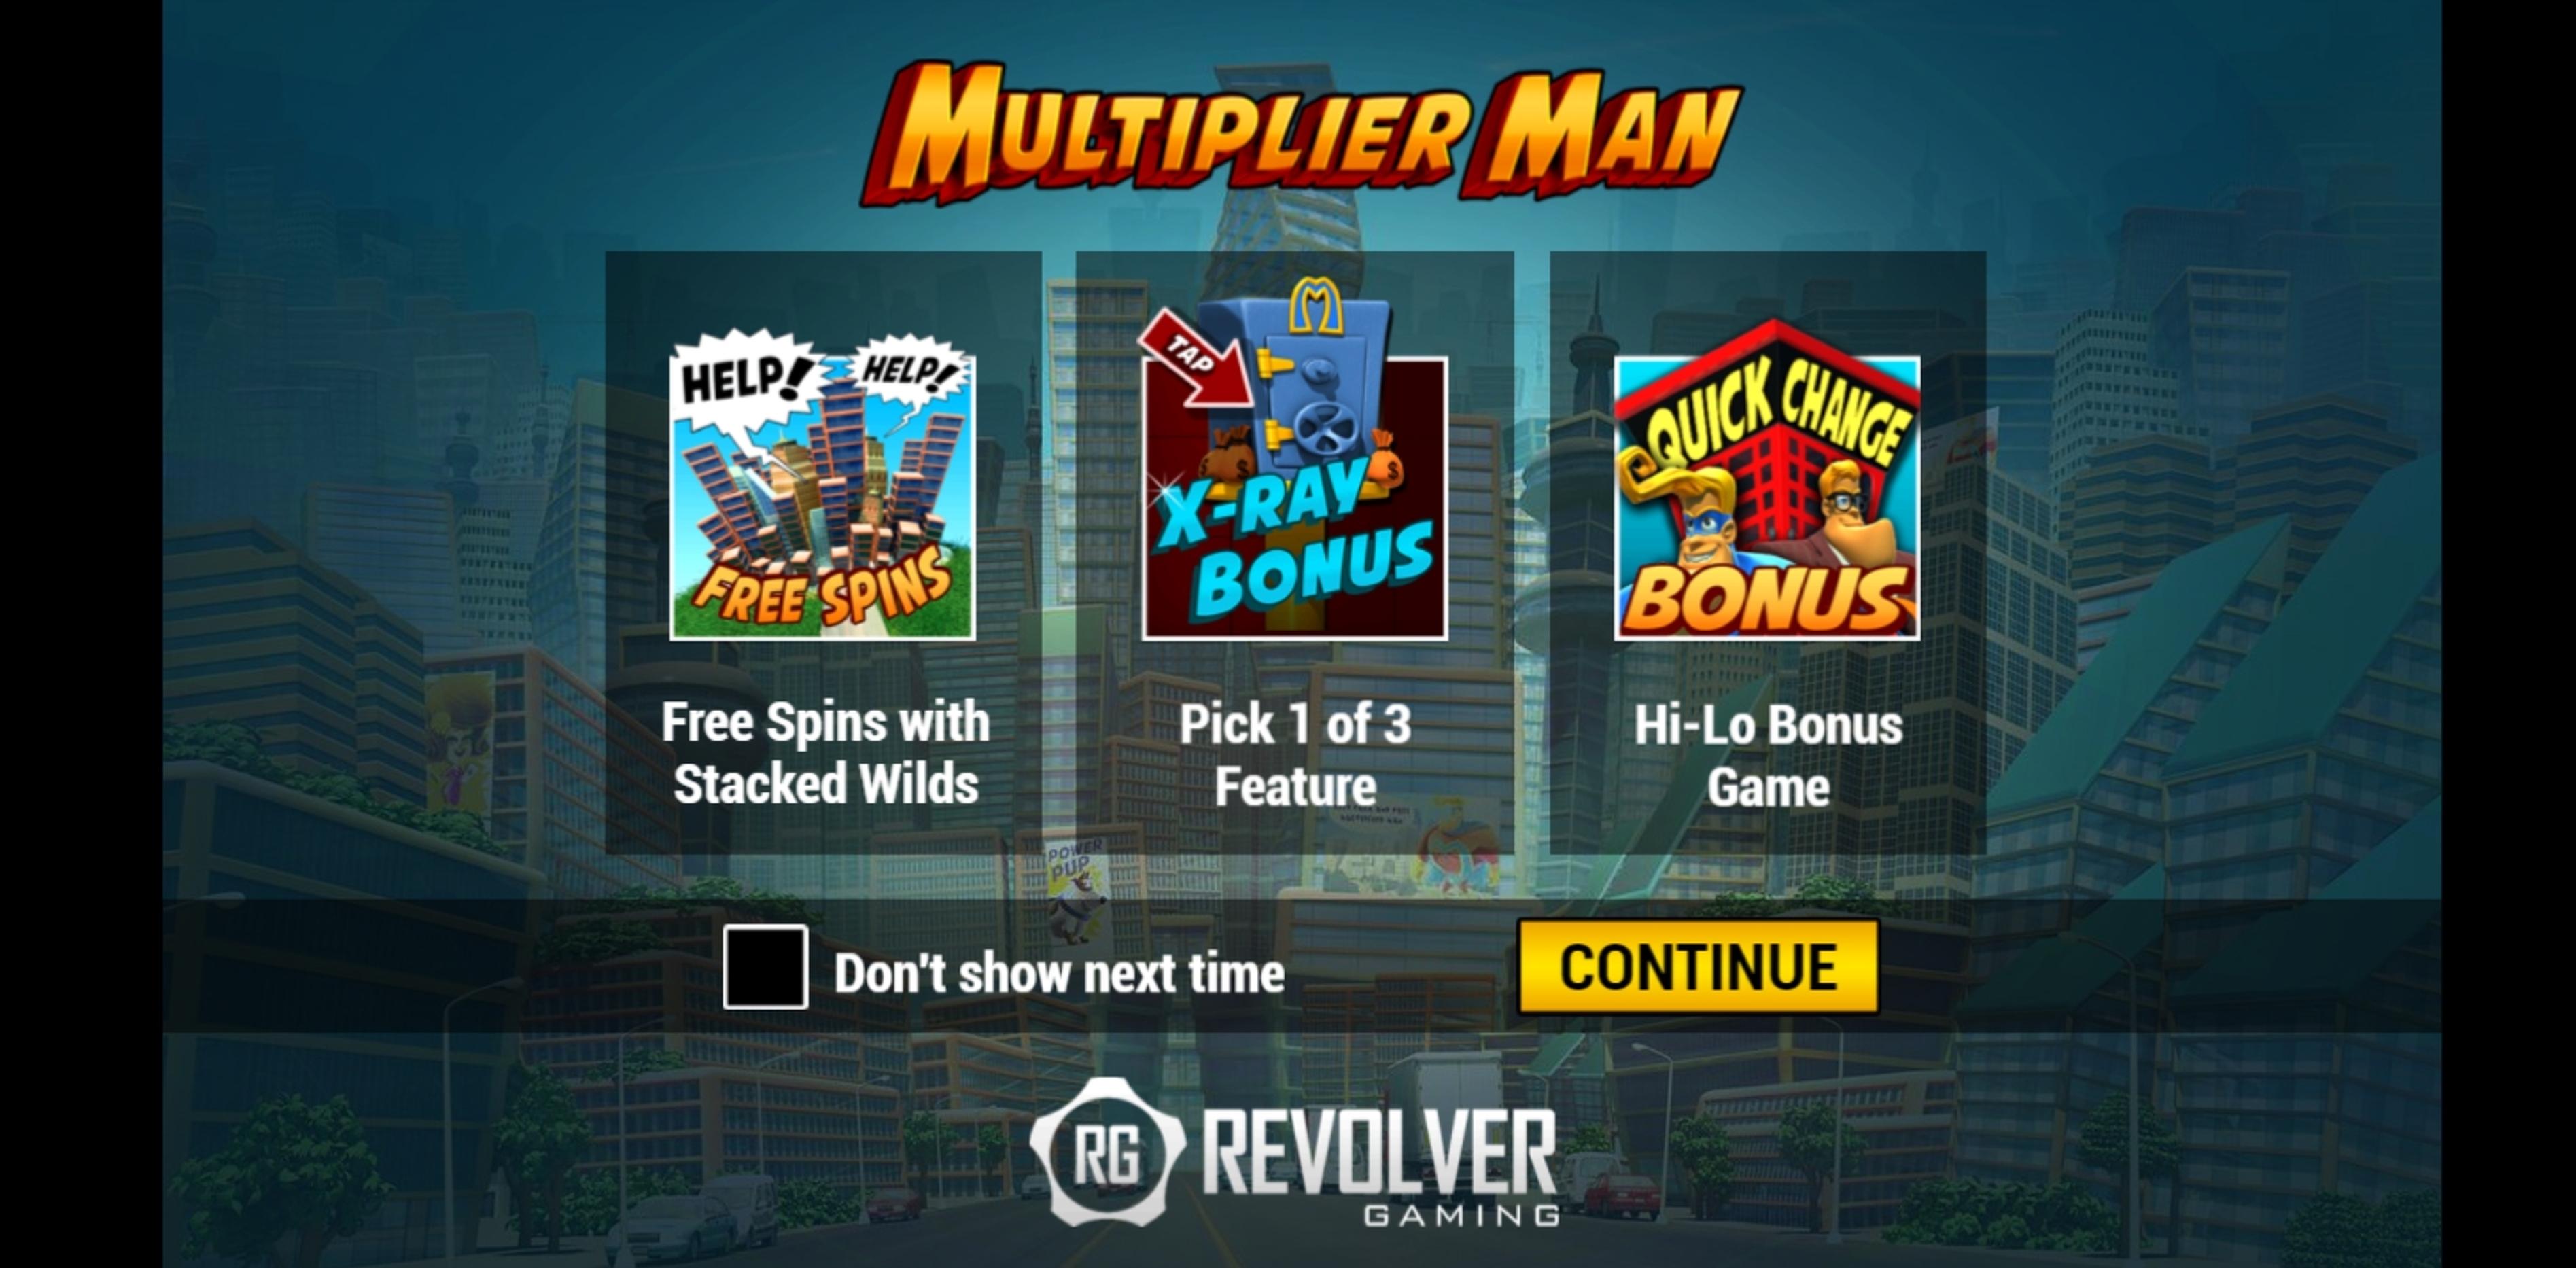 Multiplier Man Slot Machine